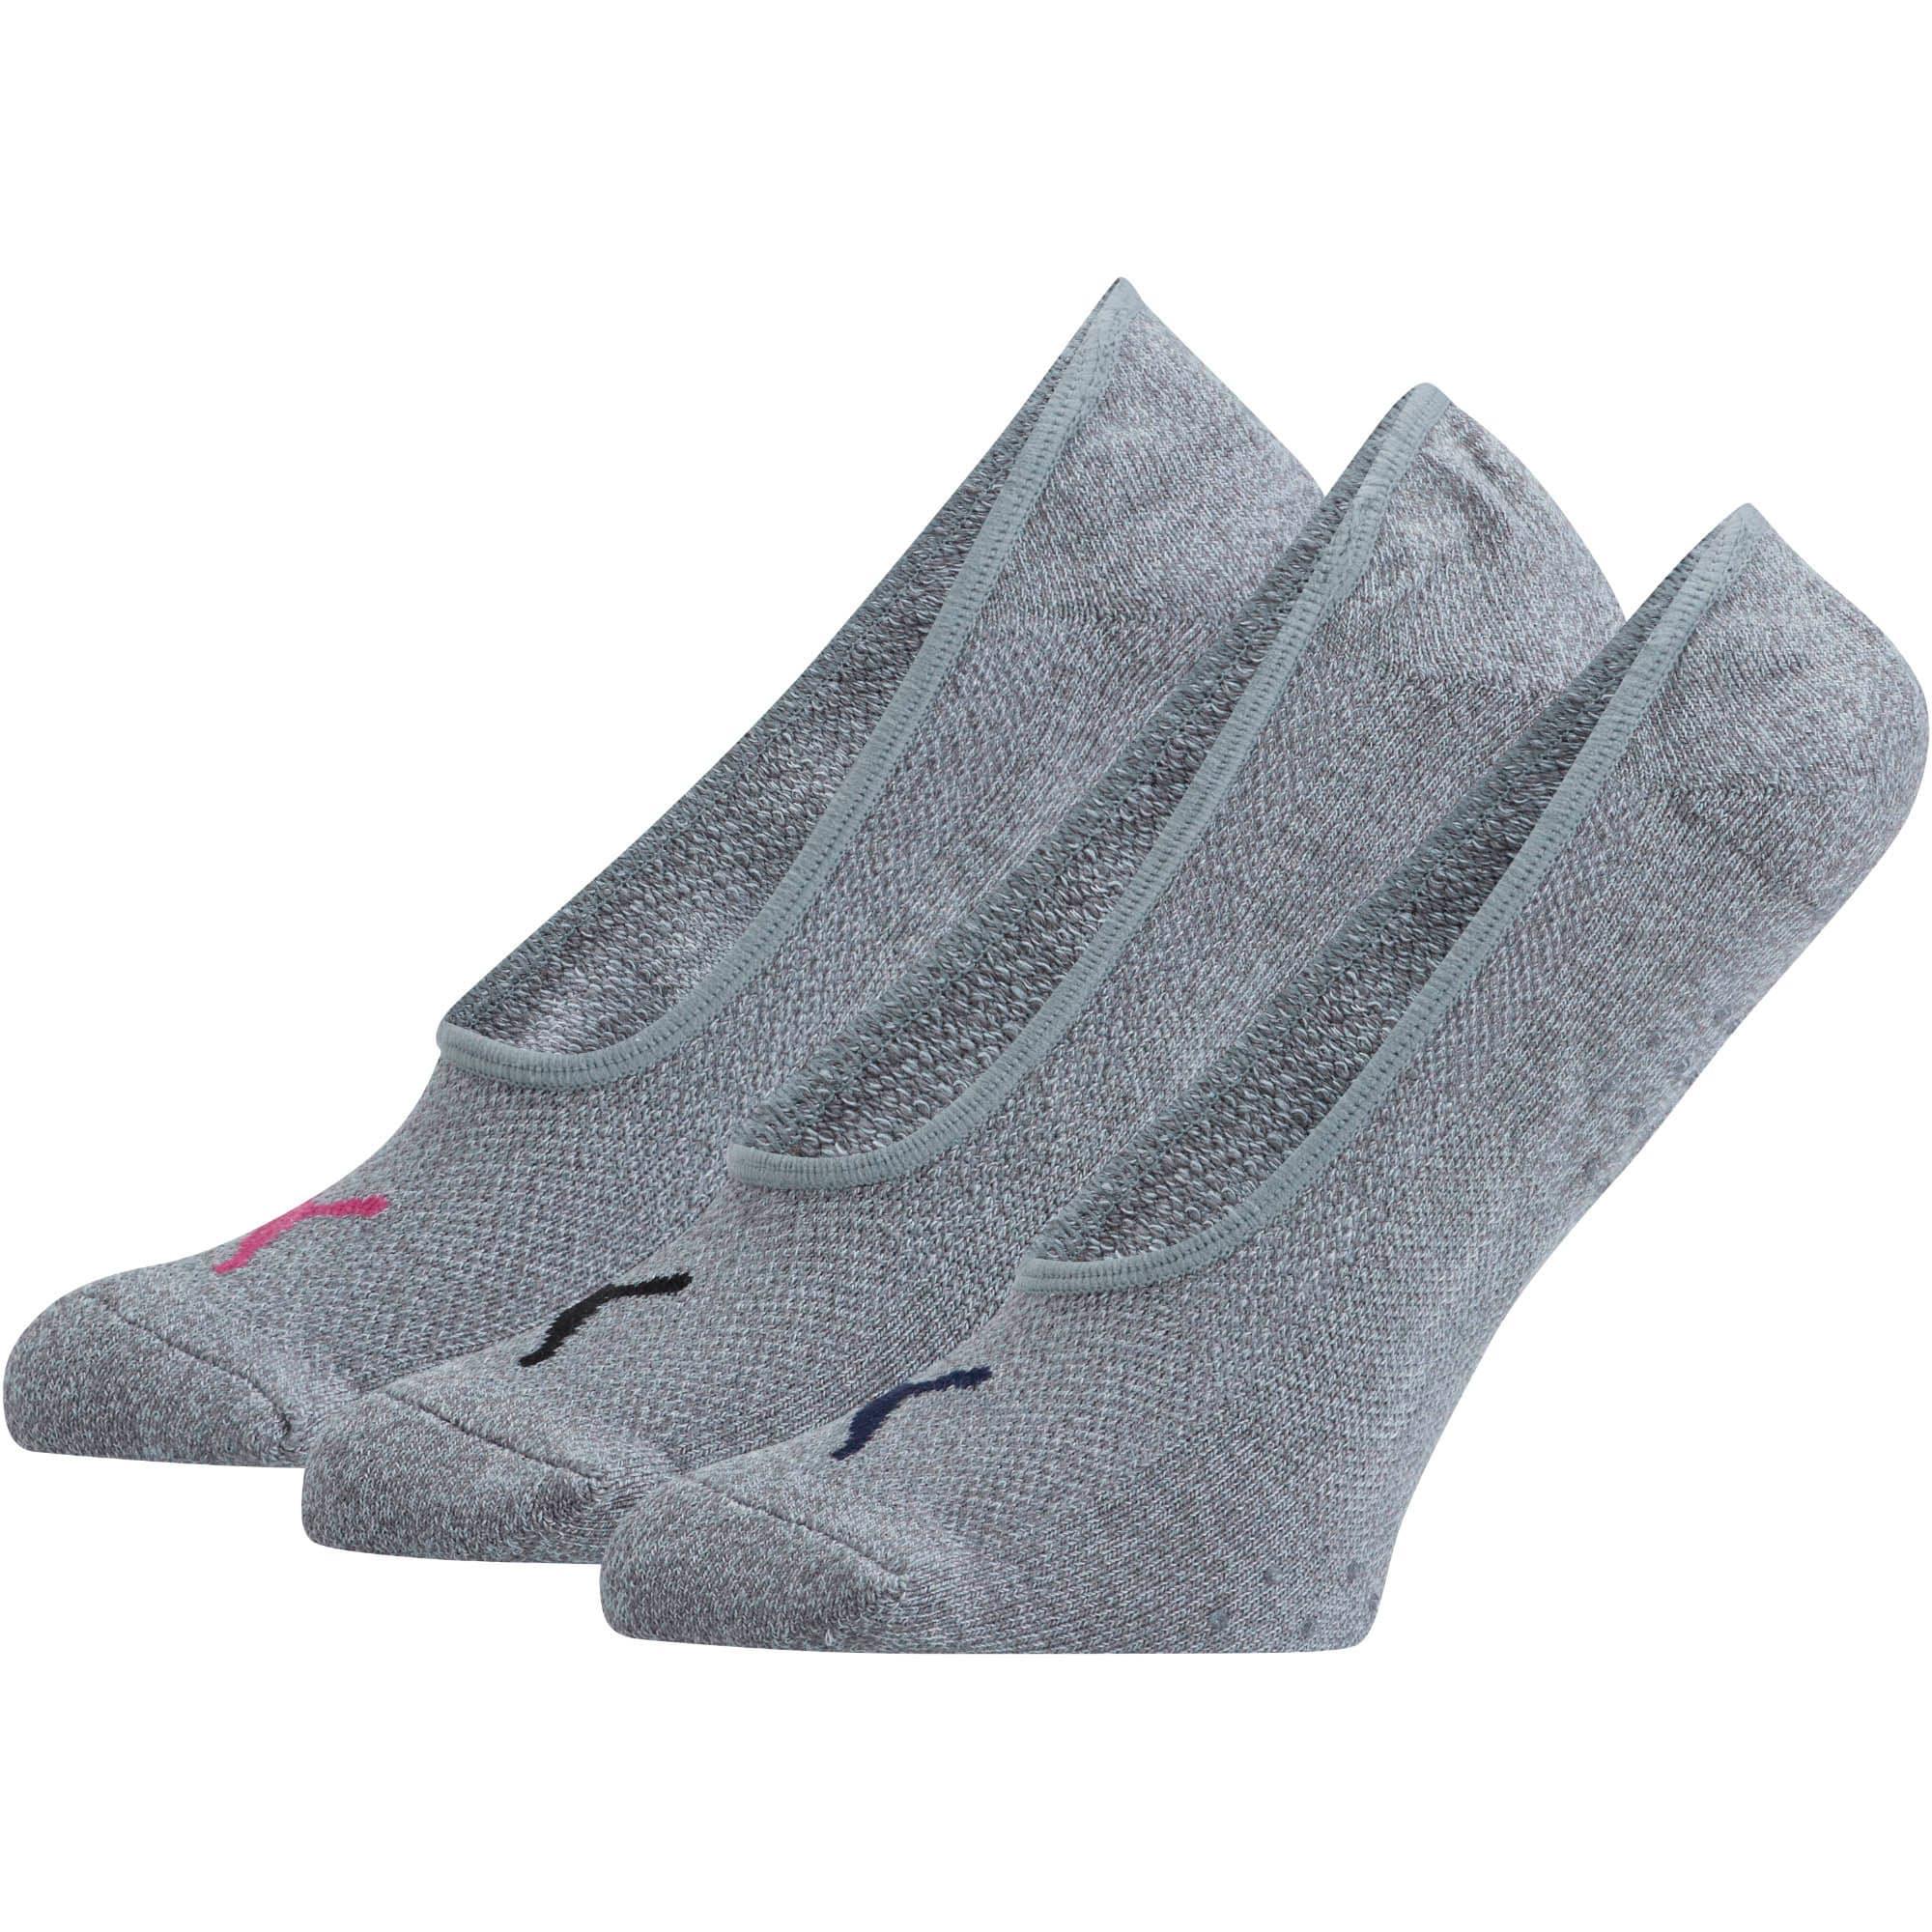 Thumbnail 1 of Women's Select Terry Liner Socks [3 Pack], MEDIUM GREY, medium